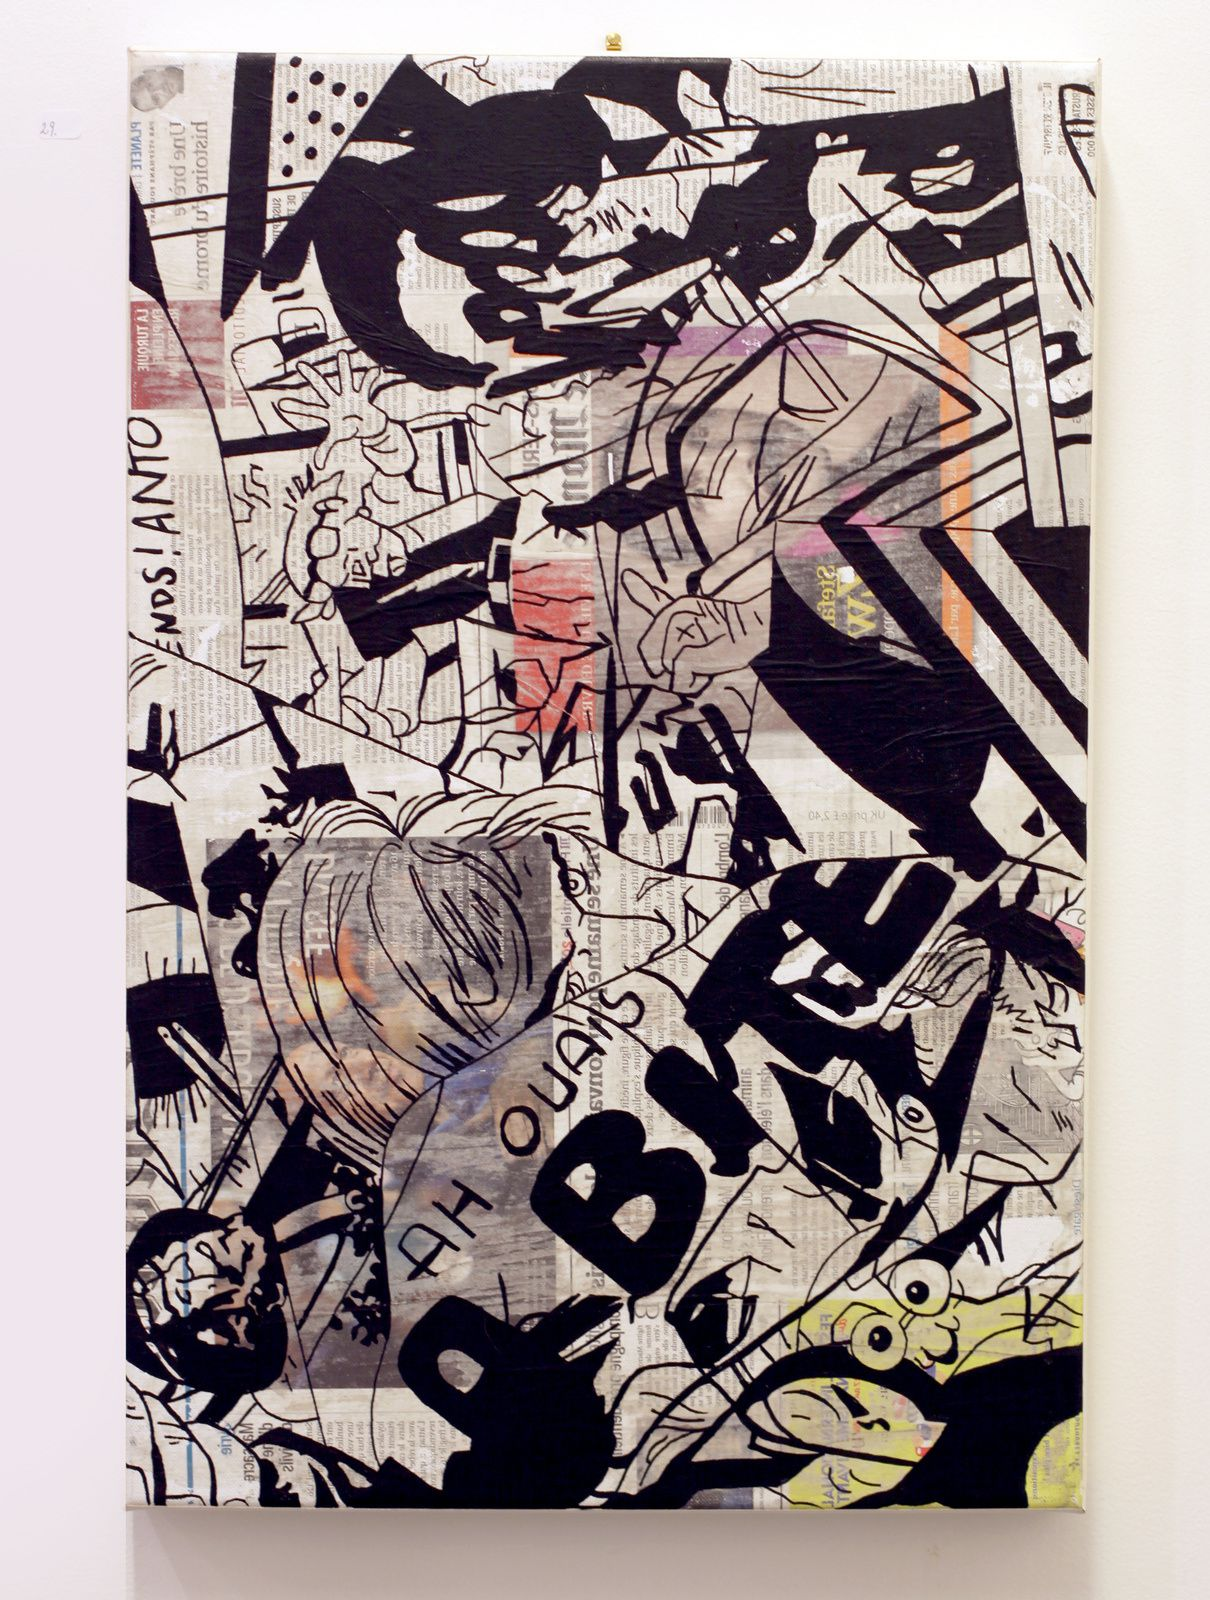 """17525"", 2017 de Benjamin SPARK - Courtesy de l'artiste et Galerie Taglialatella © Photo Éric Simon"